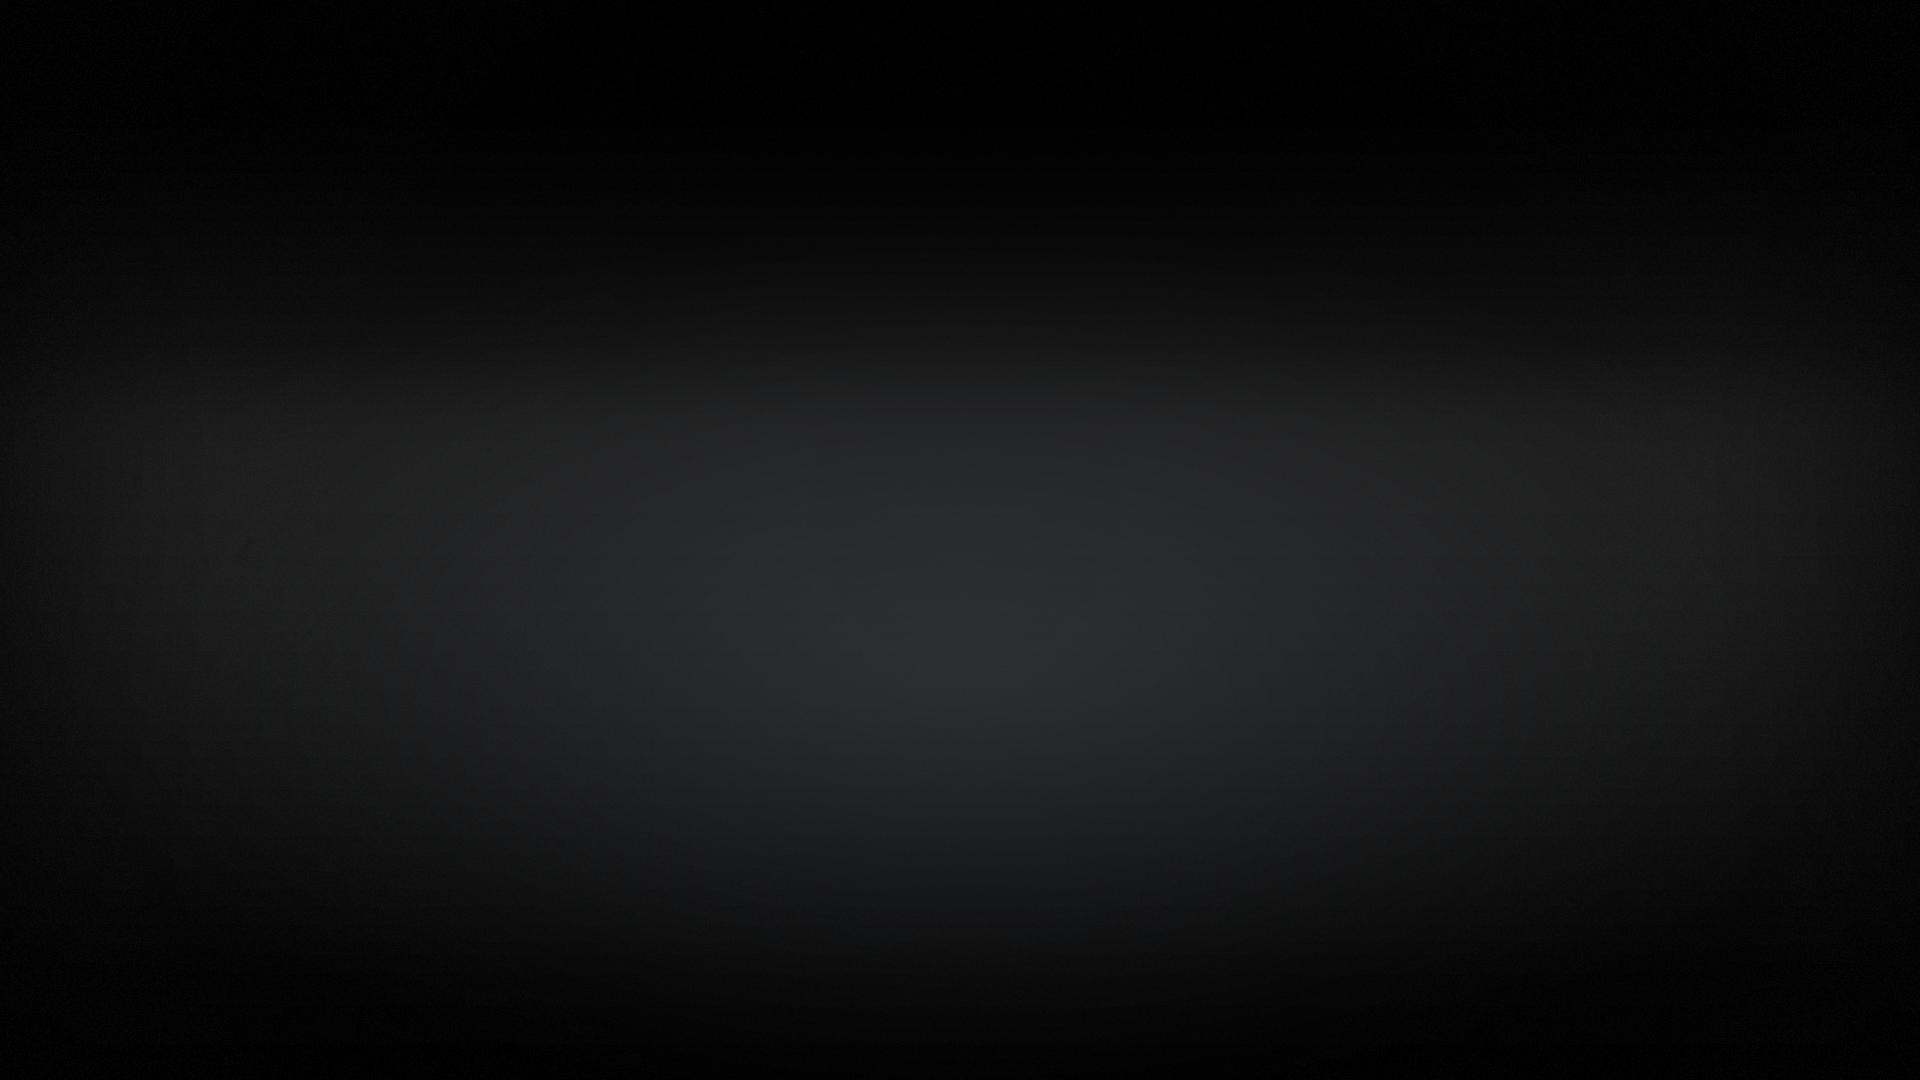 3d black backgrounds wi25 - photo #40